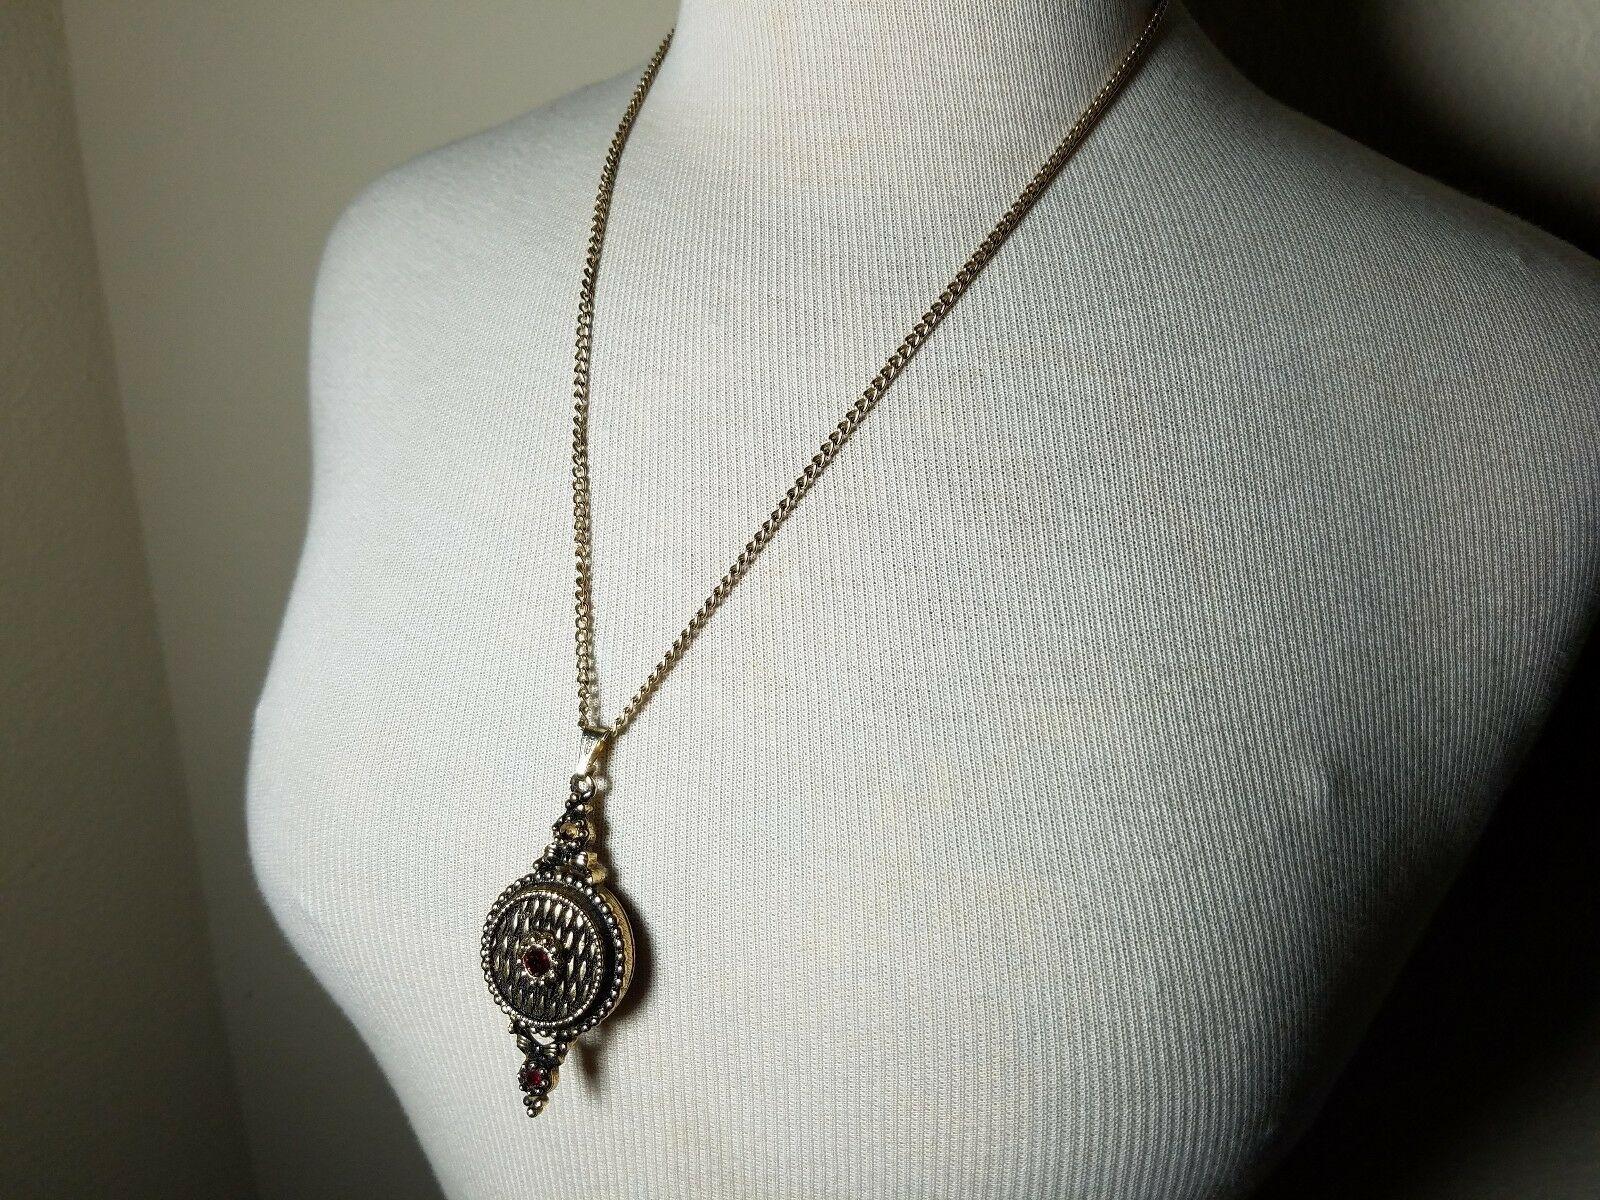 Vintage Fashion Gold Tone Locket Pendant Necklace & Matching Dangle Earrings